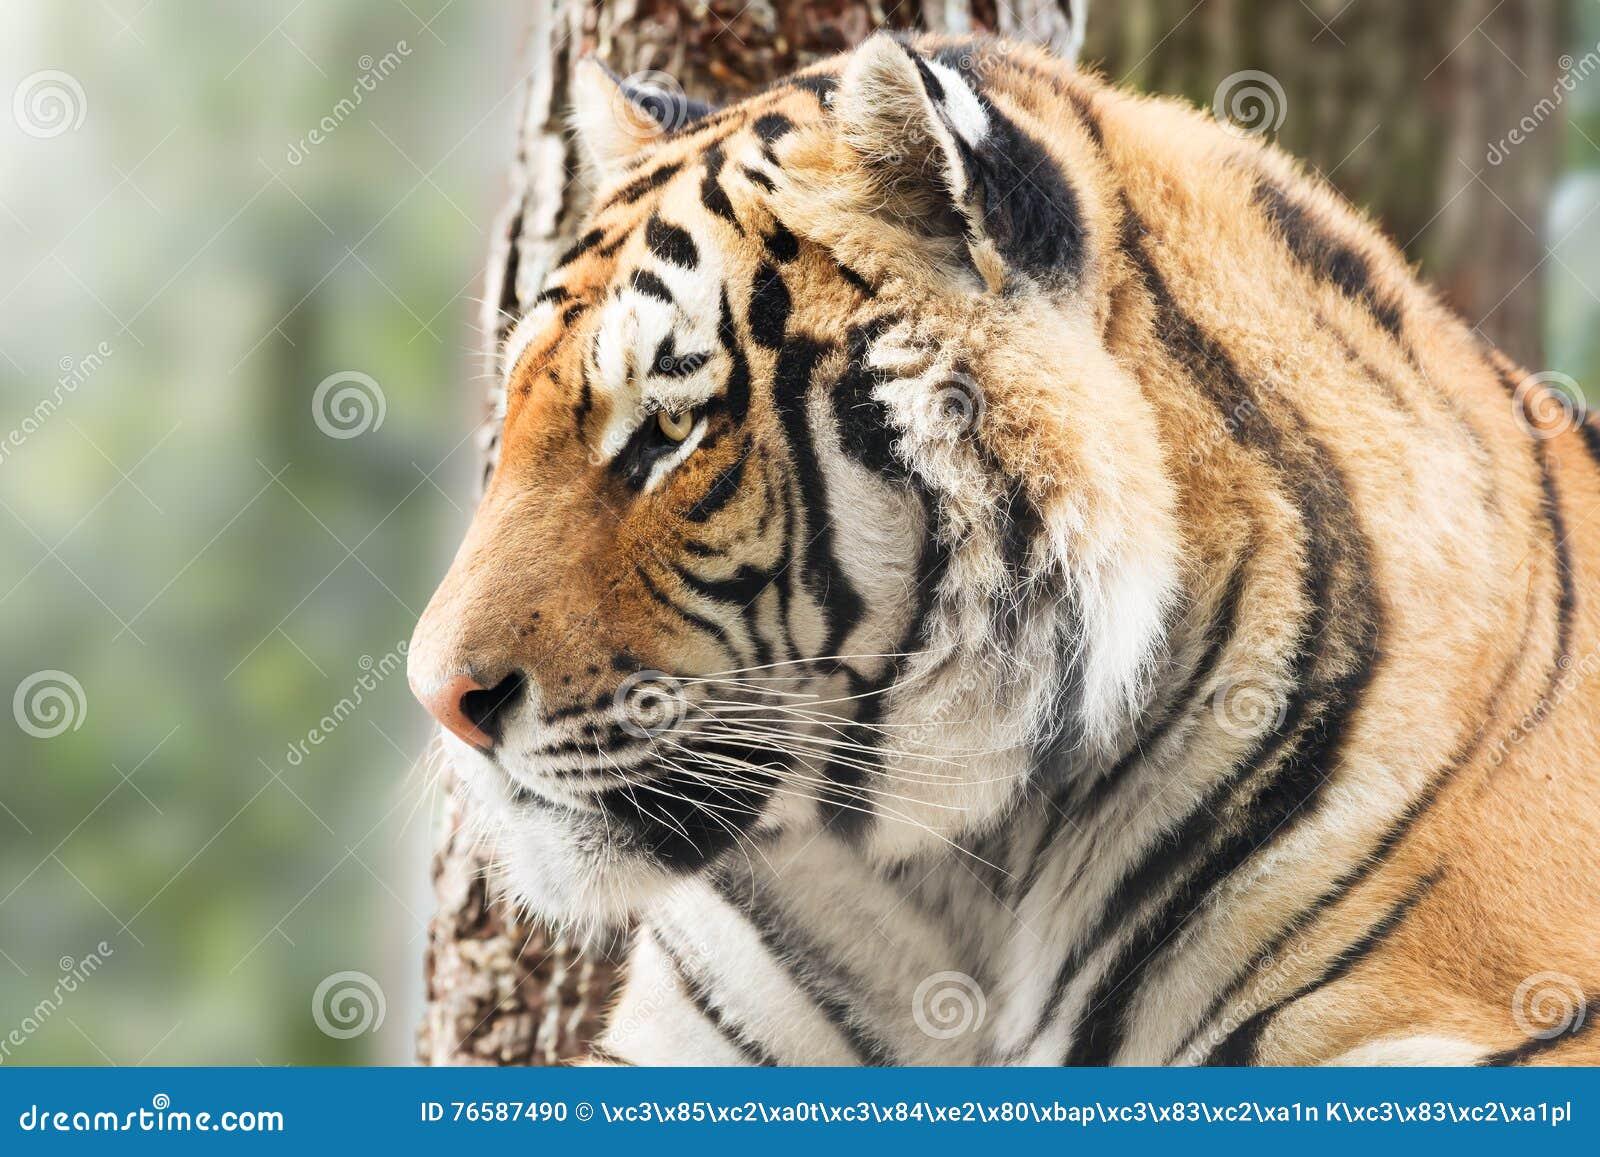 Tigre vigilante